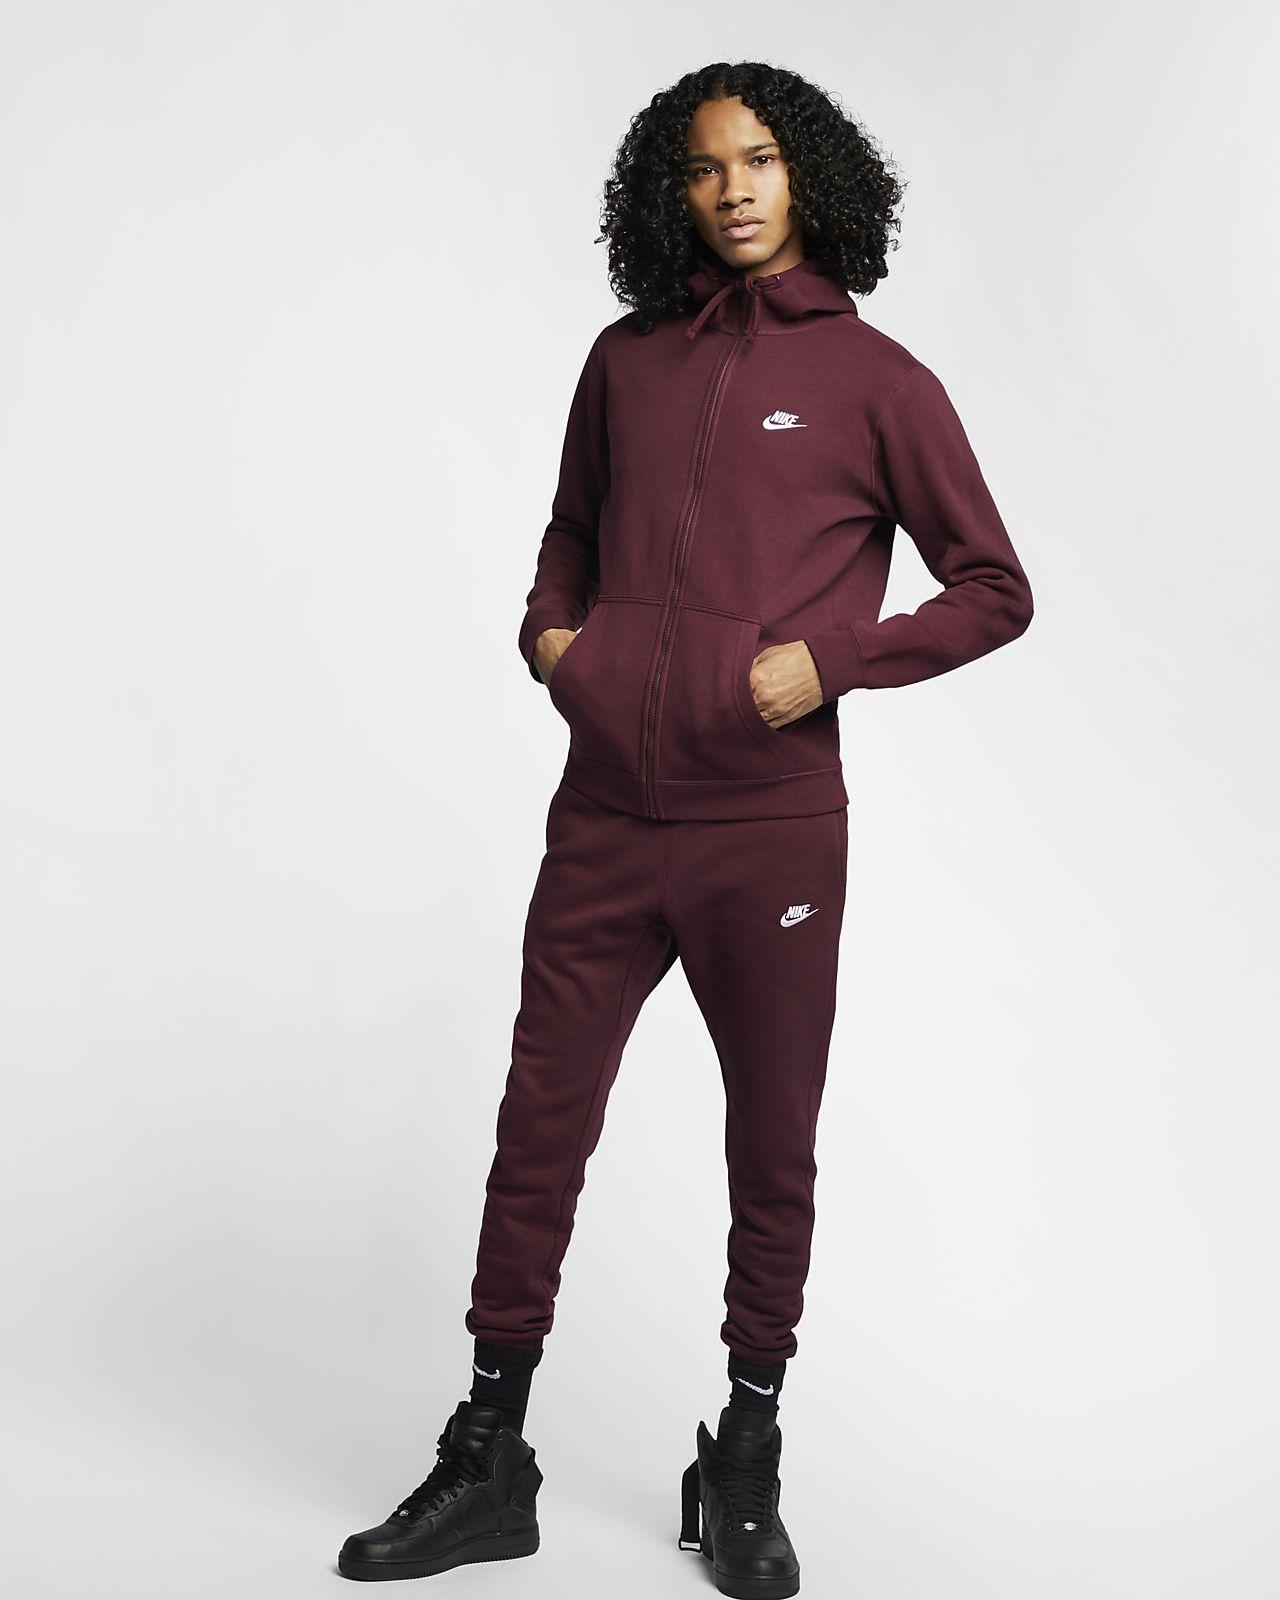 87da3880ebbe Nike Sportswear Club Fleece Men s Hoodie. Nike.com MA